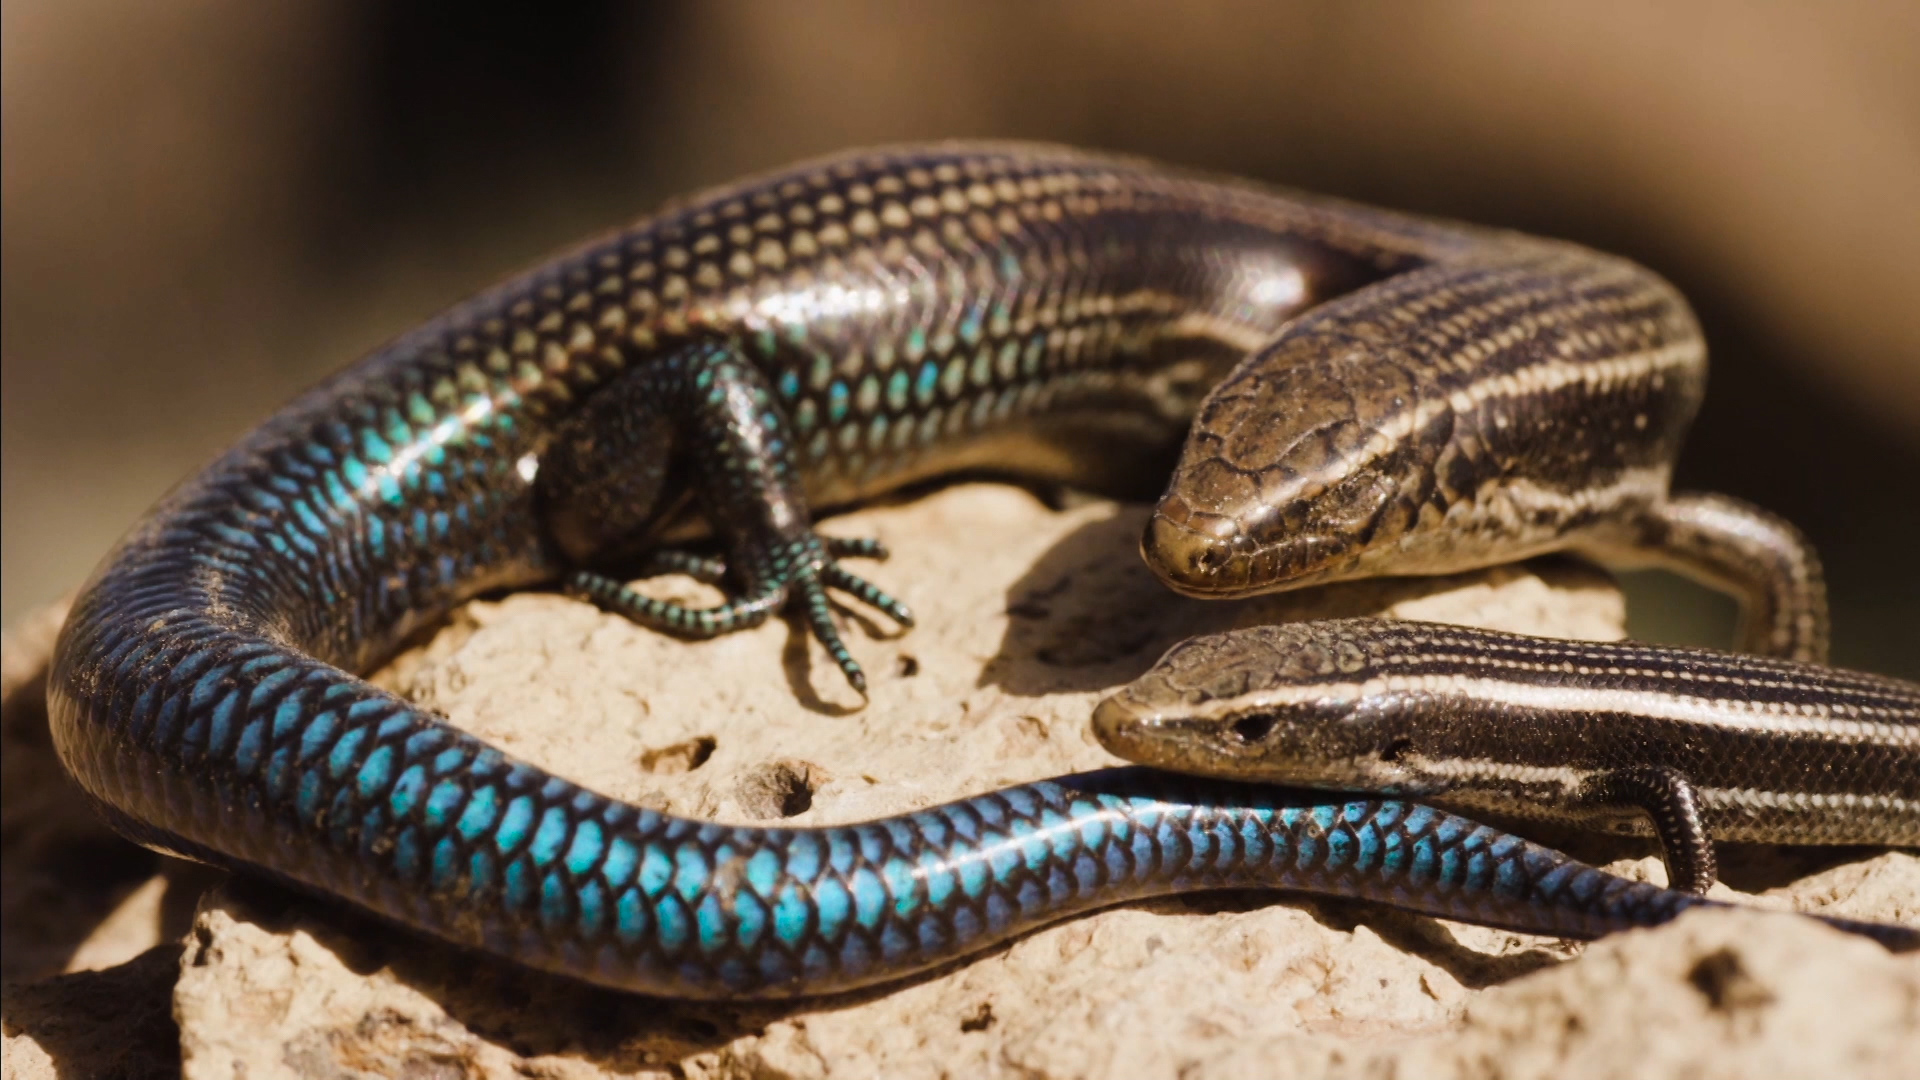 Chalcides sexlineatus o lisa grancanaria: un lagarto endémico desconocido